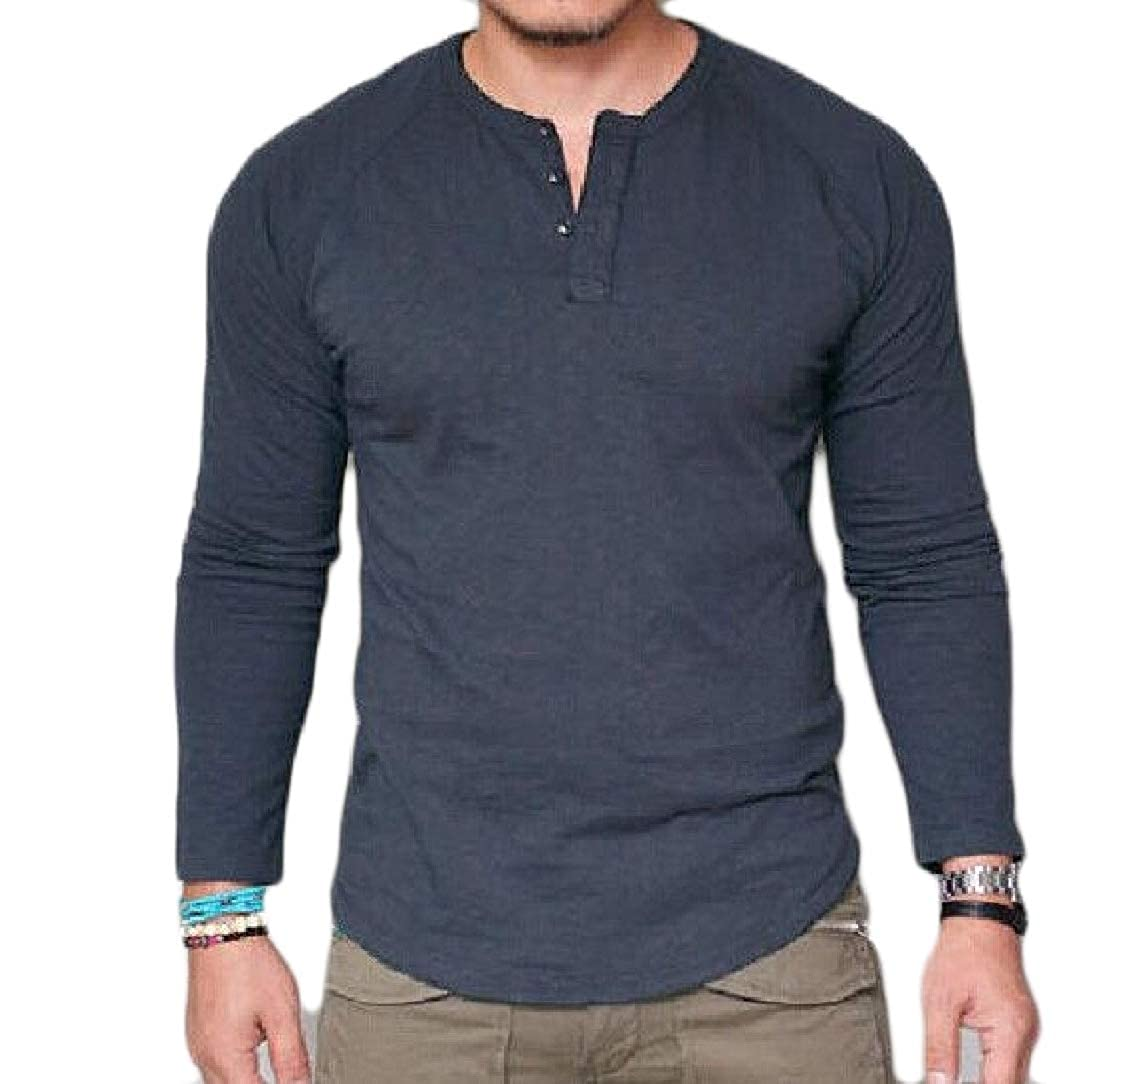 Pandapang Mens Vintage Stretch Raglan Sleeve Curved Hem Henley Top Tee T-Shirts Blue L